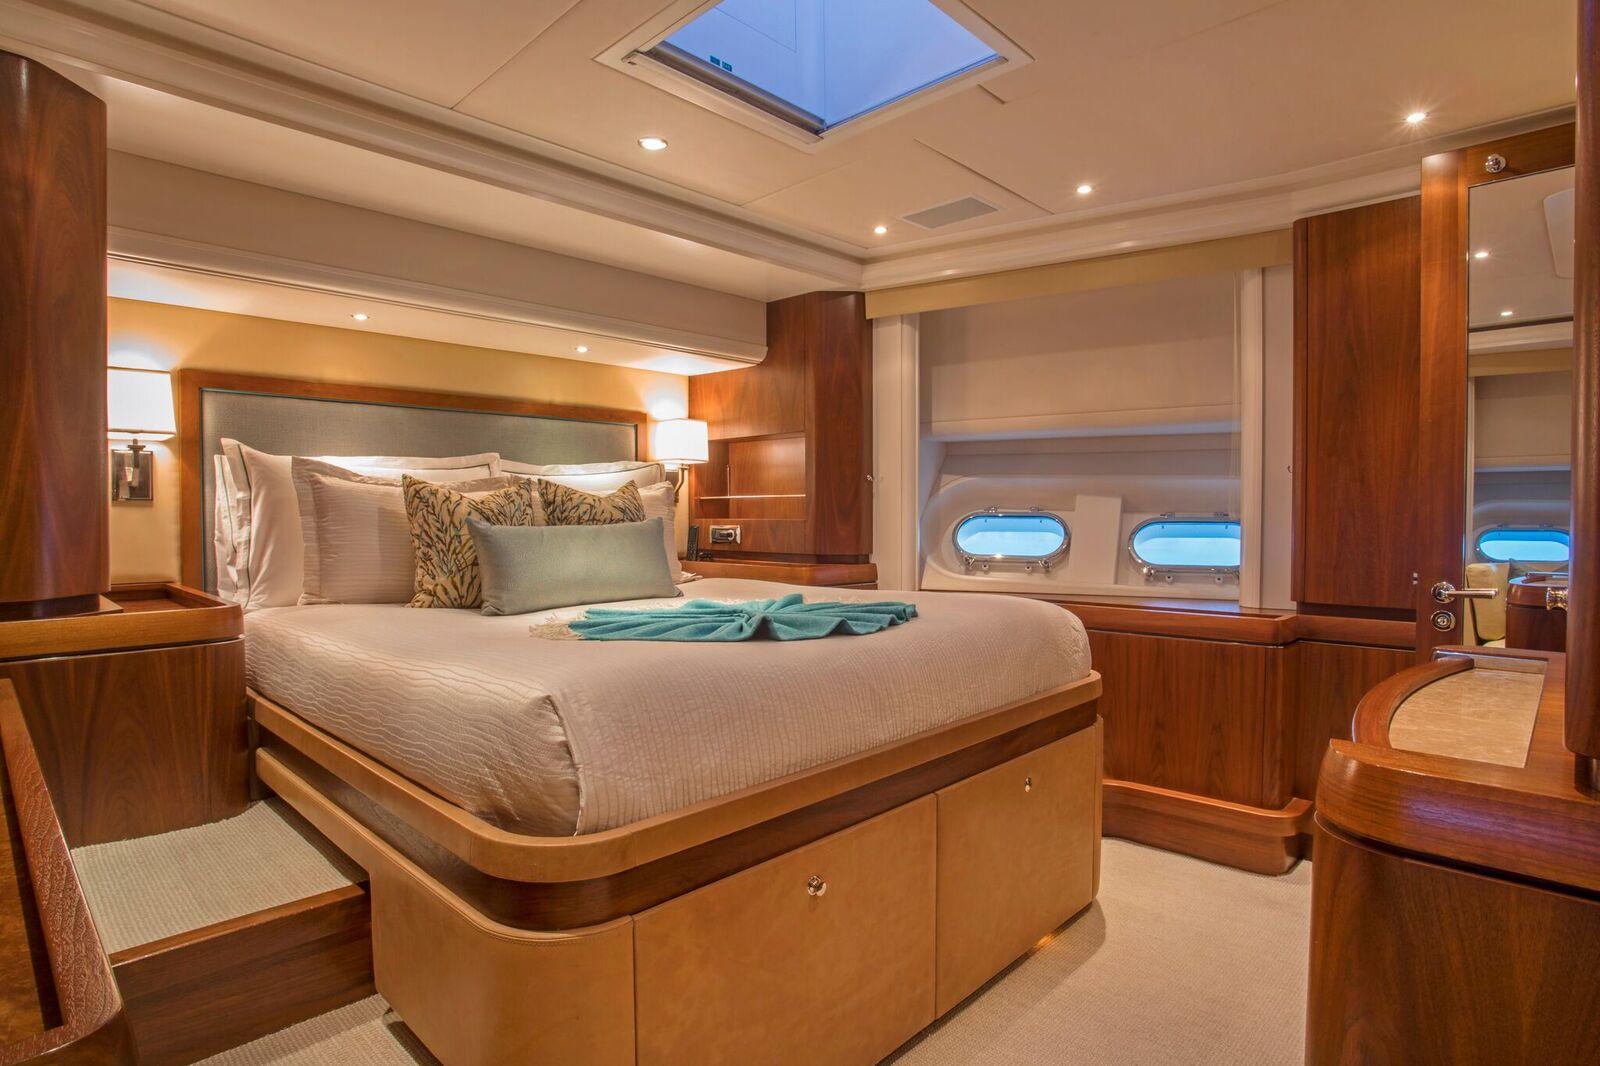 VIP linens and headboard